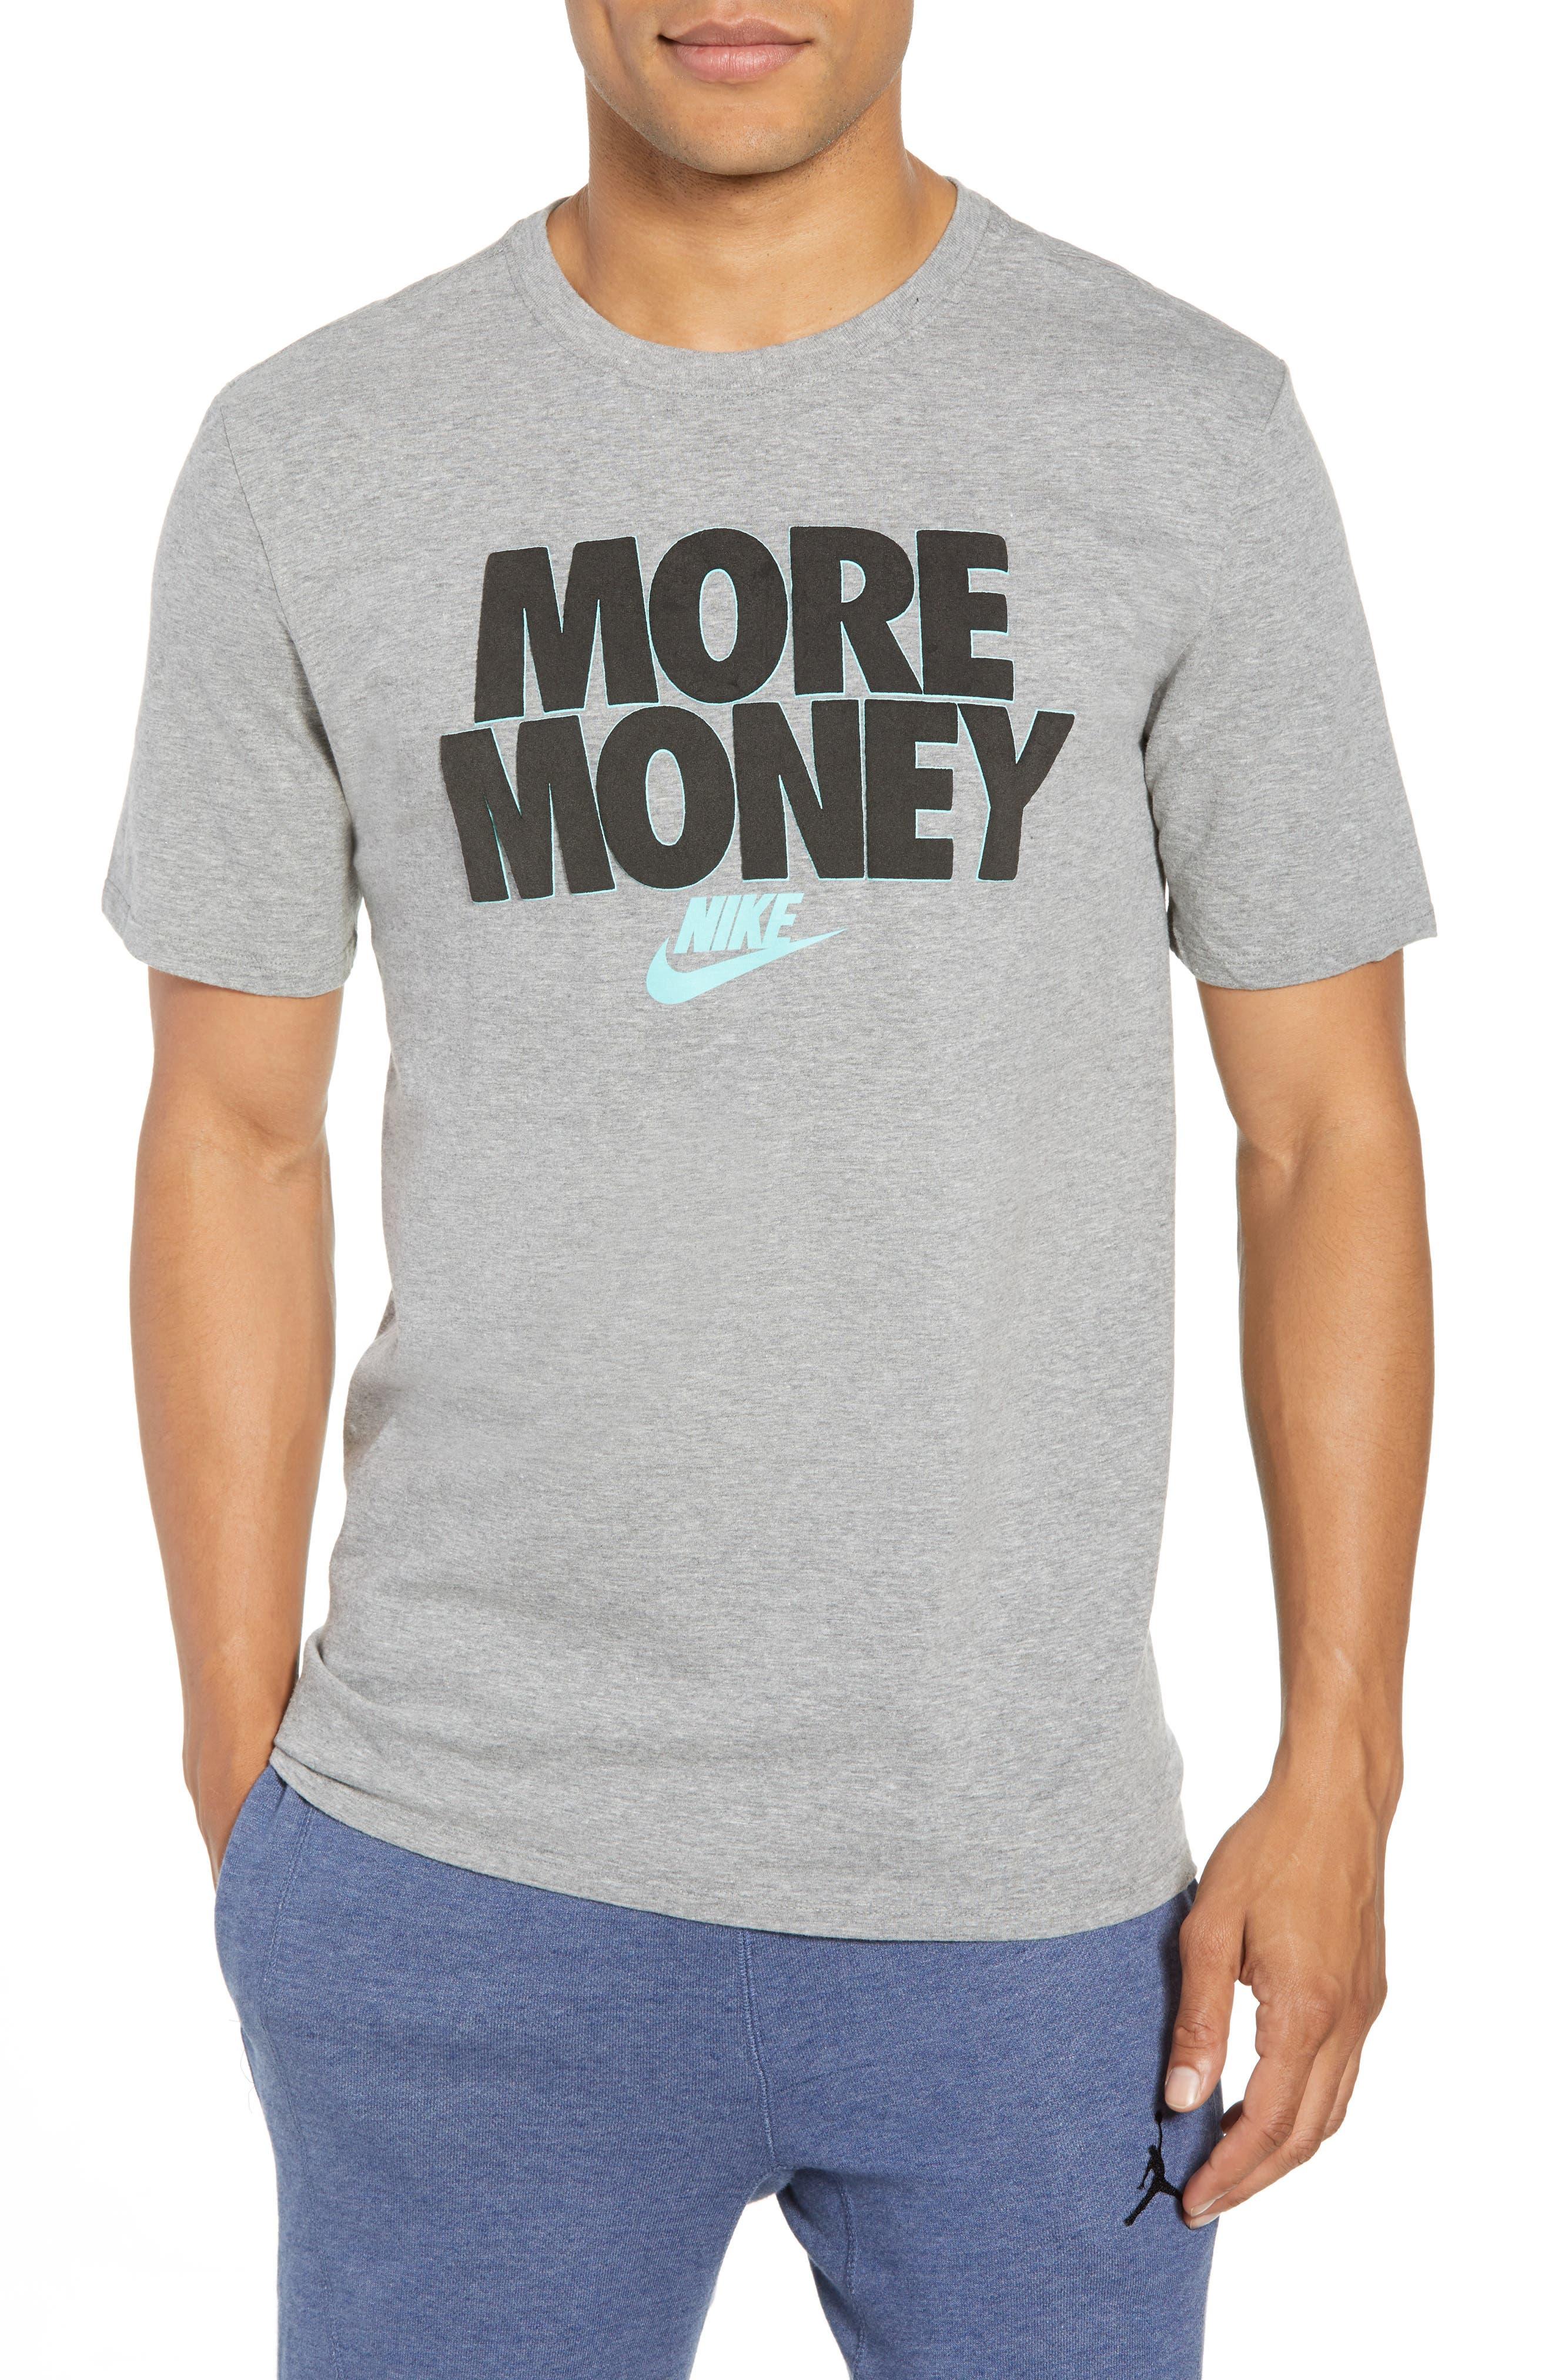 Sportswear More Money T-Shirt,                             Main thumbnail 1, color,                             DK GREY HEATHER/ BLACK